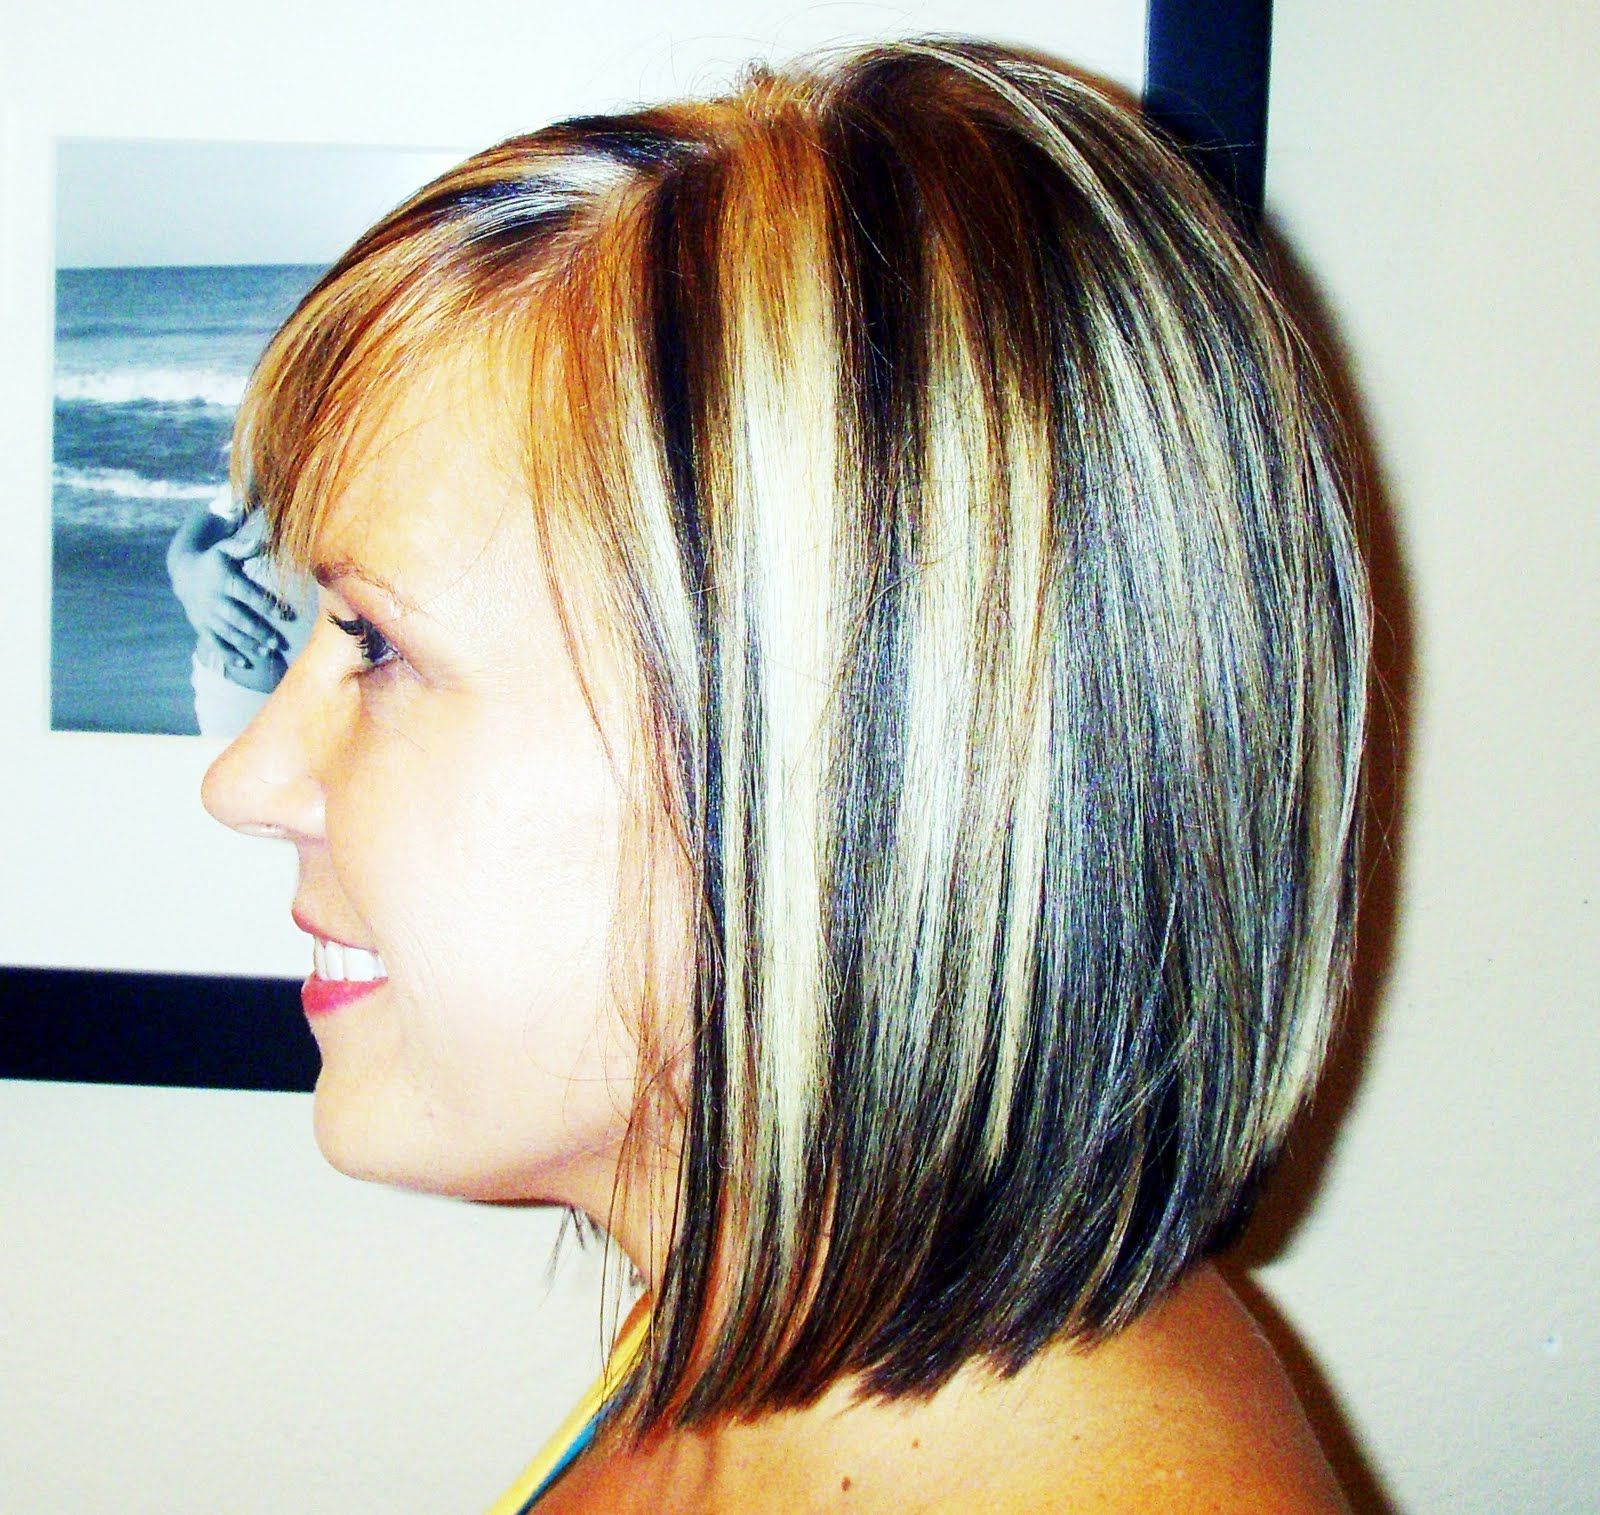 Kelly Clarkson Bob Haircut | Kelly Clarkson Hair Color | Hairstyles Inside Kelly Clarkson Short Haircut (View 6 of 25)